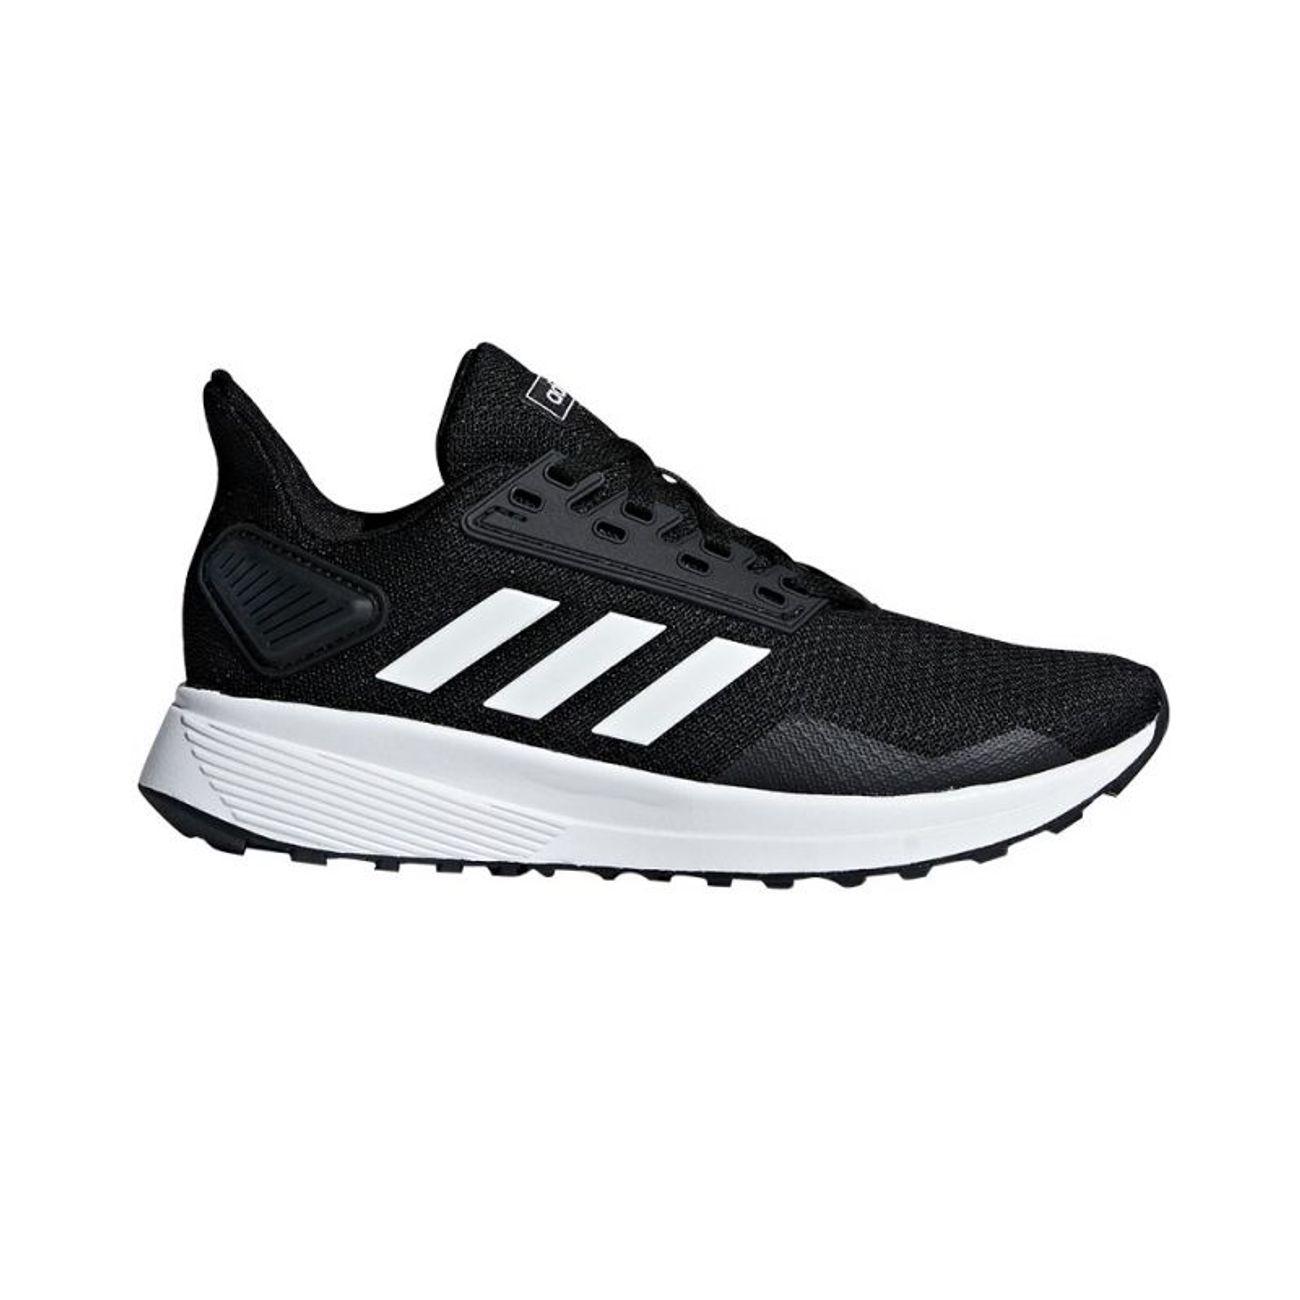 Adidas Duramo 8 – achat pas cher GO Sport